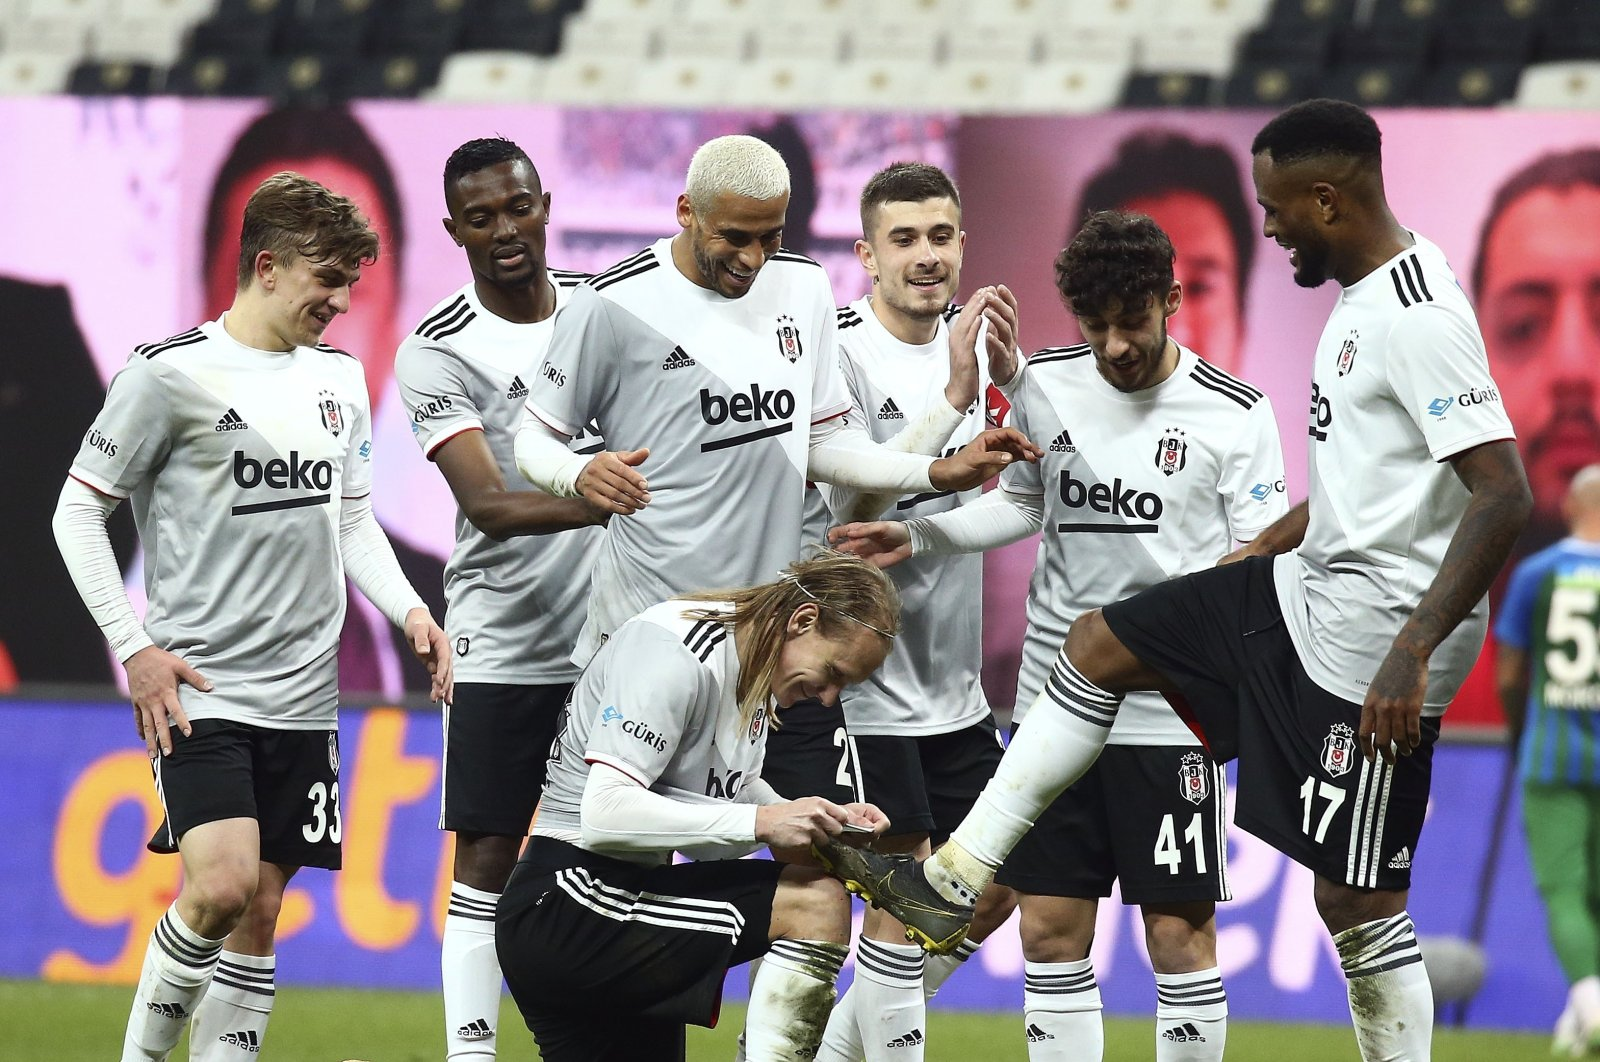 Beşiktaş players celebrate a goal during a Süper Lig match against Rizespor at the Vodefone Park stadium, in Istanbul, Turkey, Jan. 6, 2021. (IHA Photo)